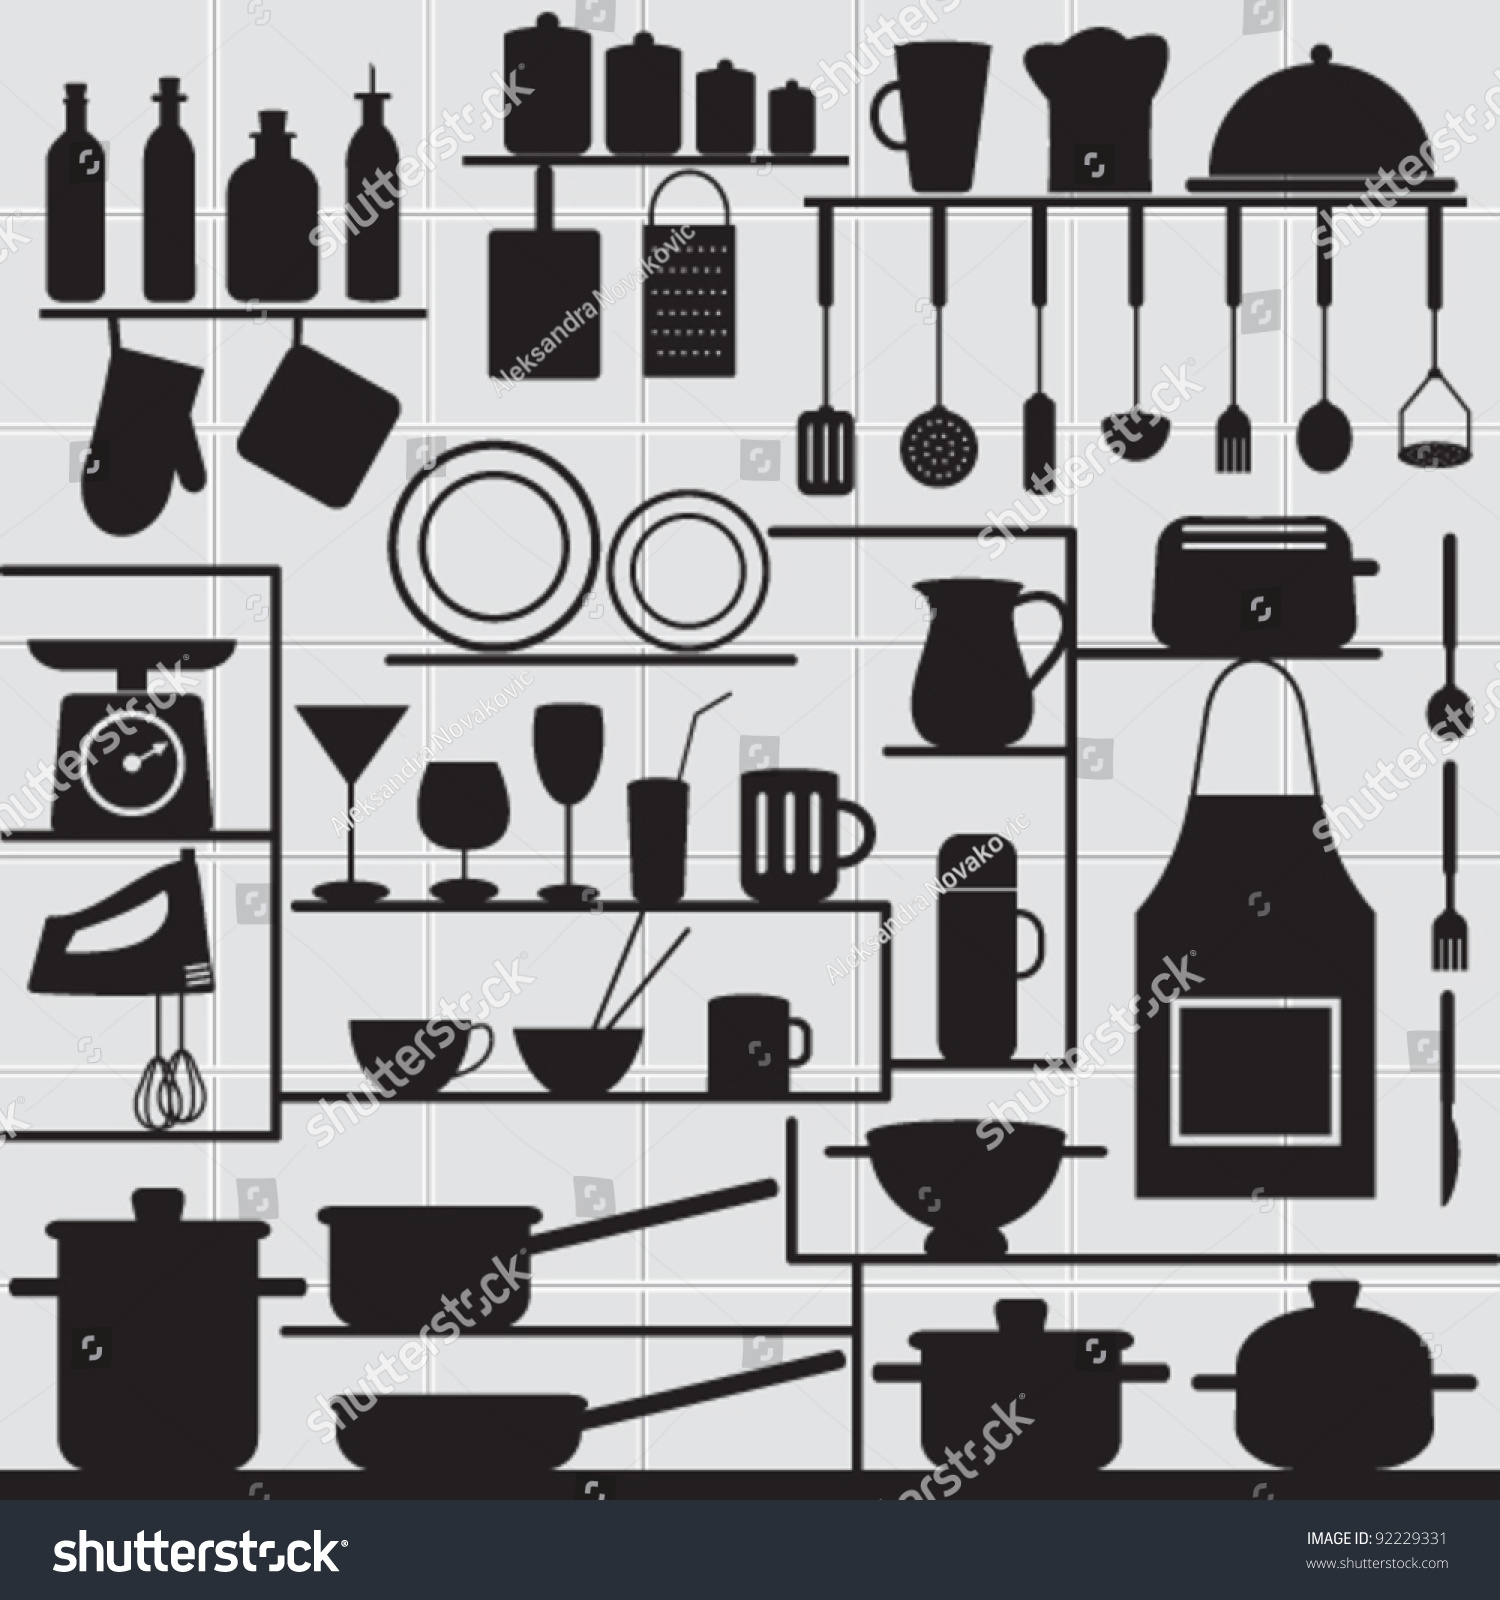 Kitchen Symbles Images  Usseekcom. Finnish Kitchen Design. Designer Kitchen Lights. Designer Kitchen And Bathroom. Kitchen Design Tools Online Free. Latest Kitchen Designs In Kerala. Cheap Kitchen Design. Kitchen Chimney Design. Kitchen Design Software Online